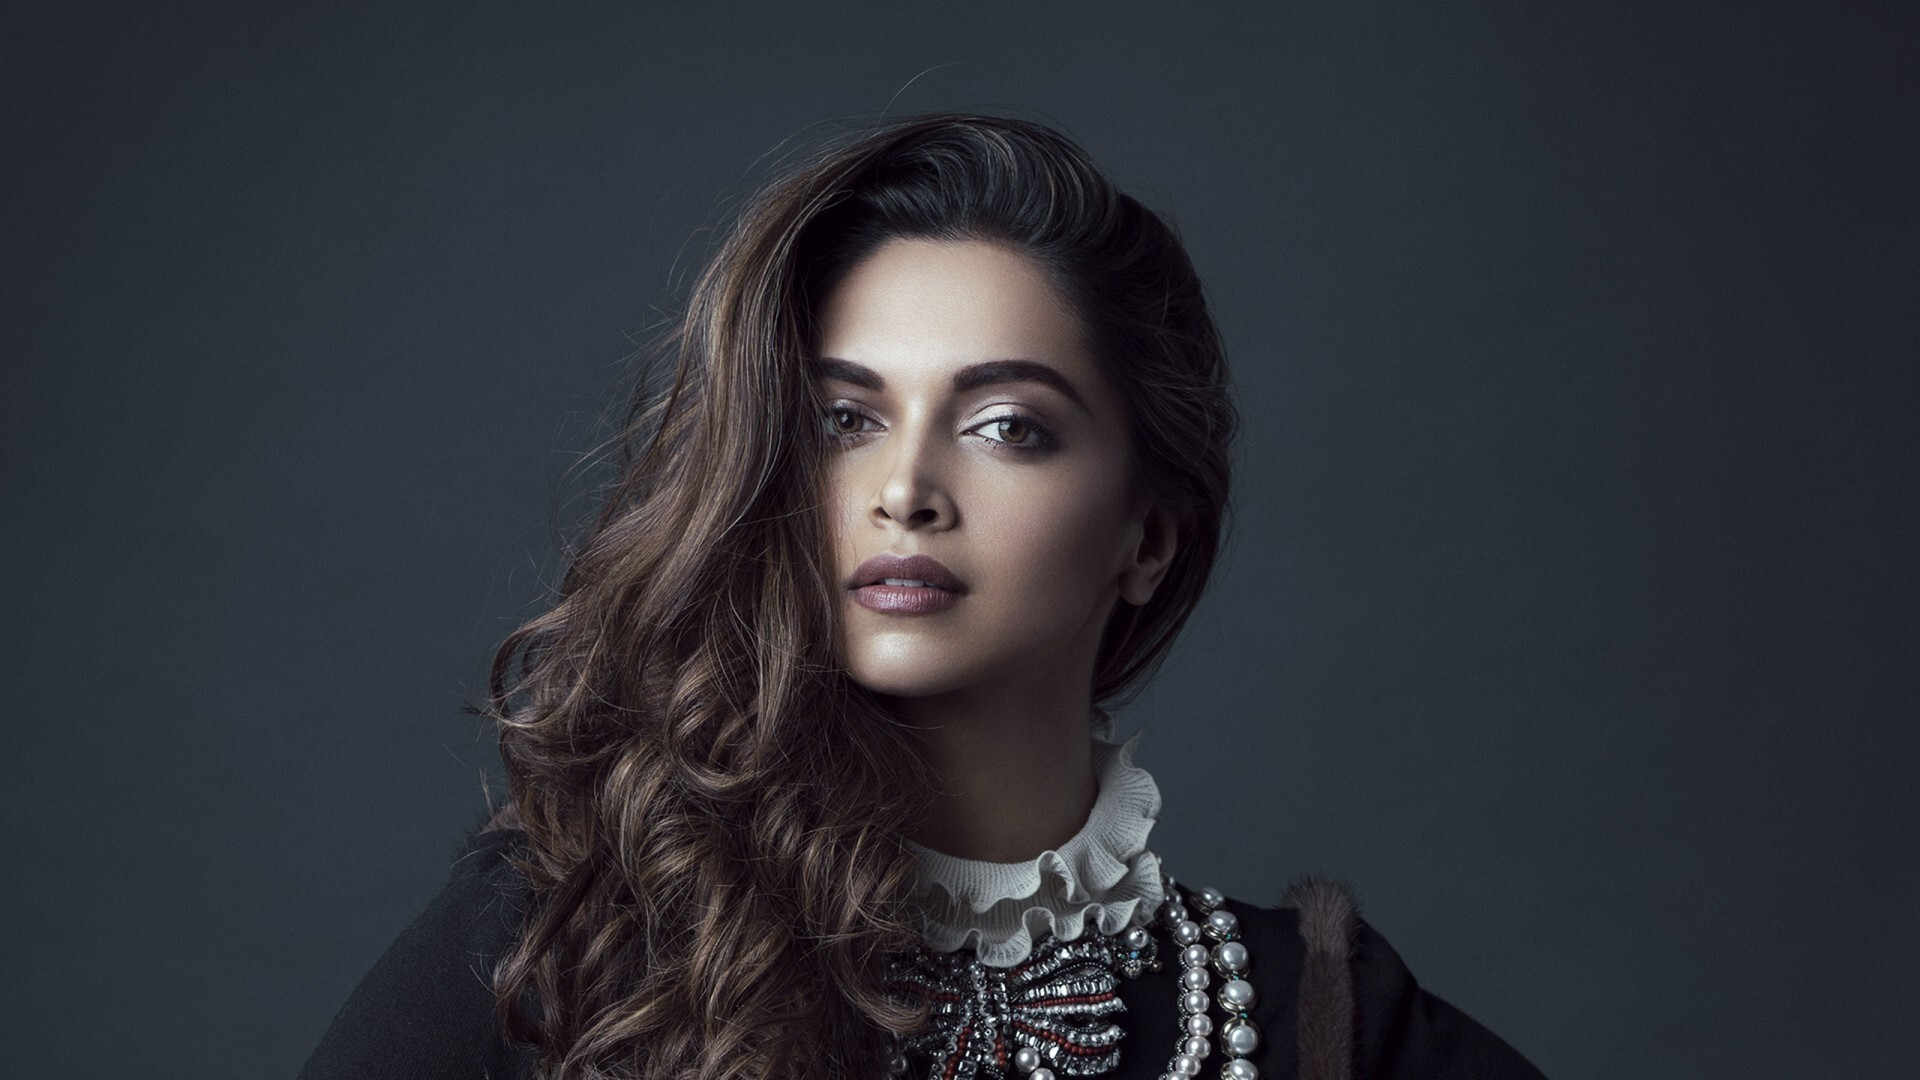 bollywood actress deepika padukone wallpaper | hd wallpapers